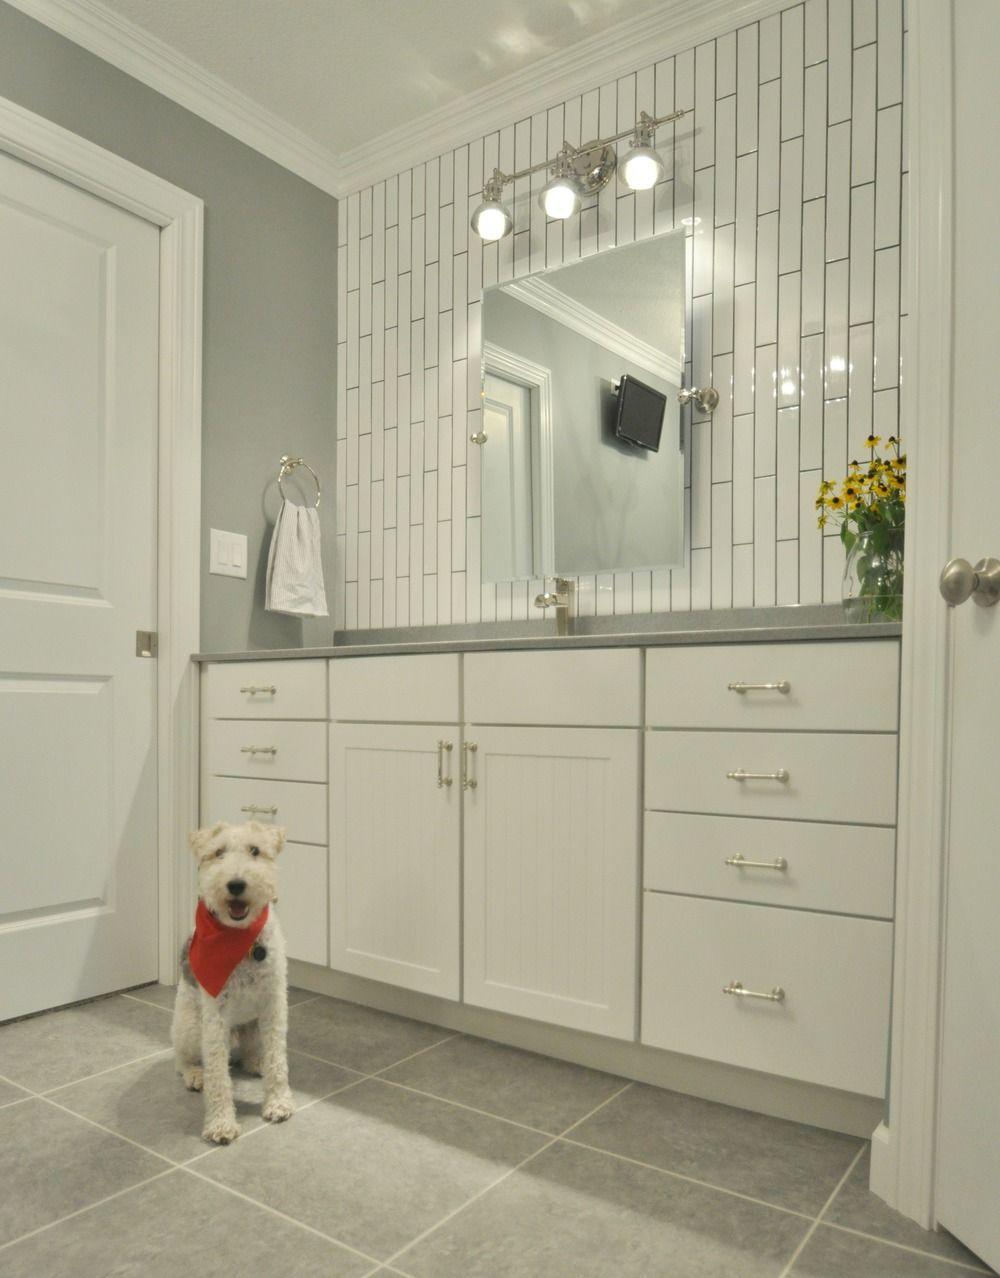 Master Bathroom Reveal The Tile Subway Polished Nickel Finishes